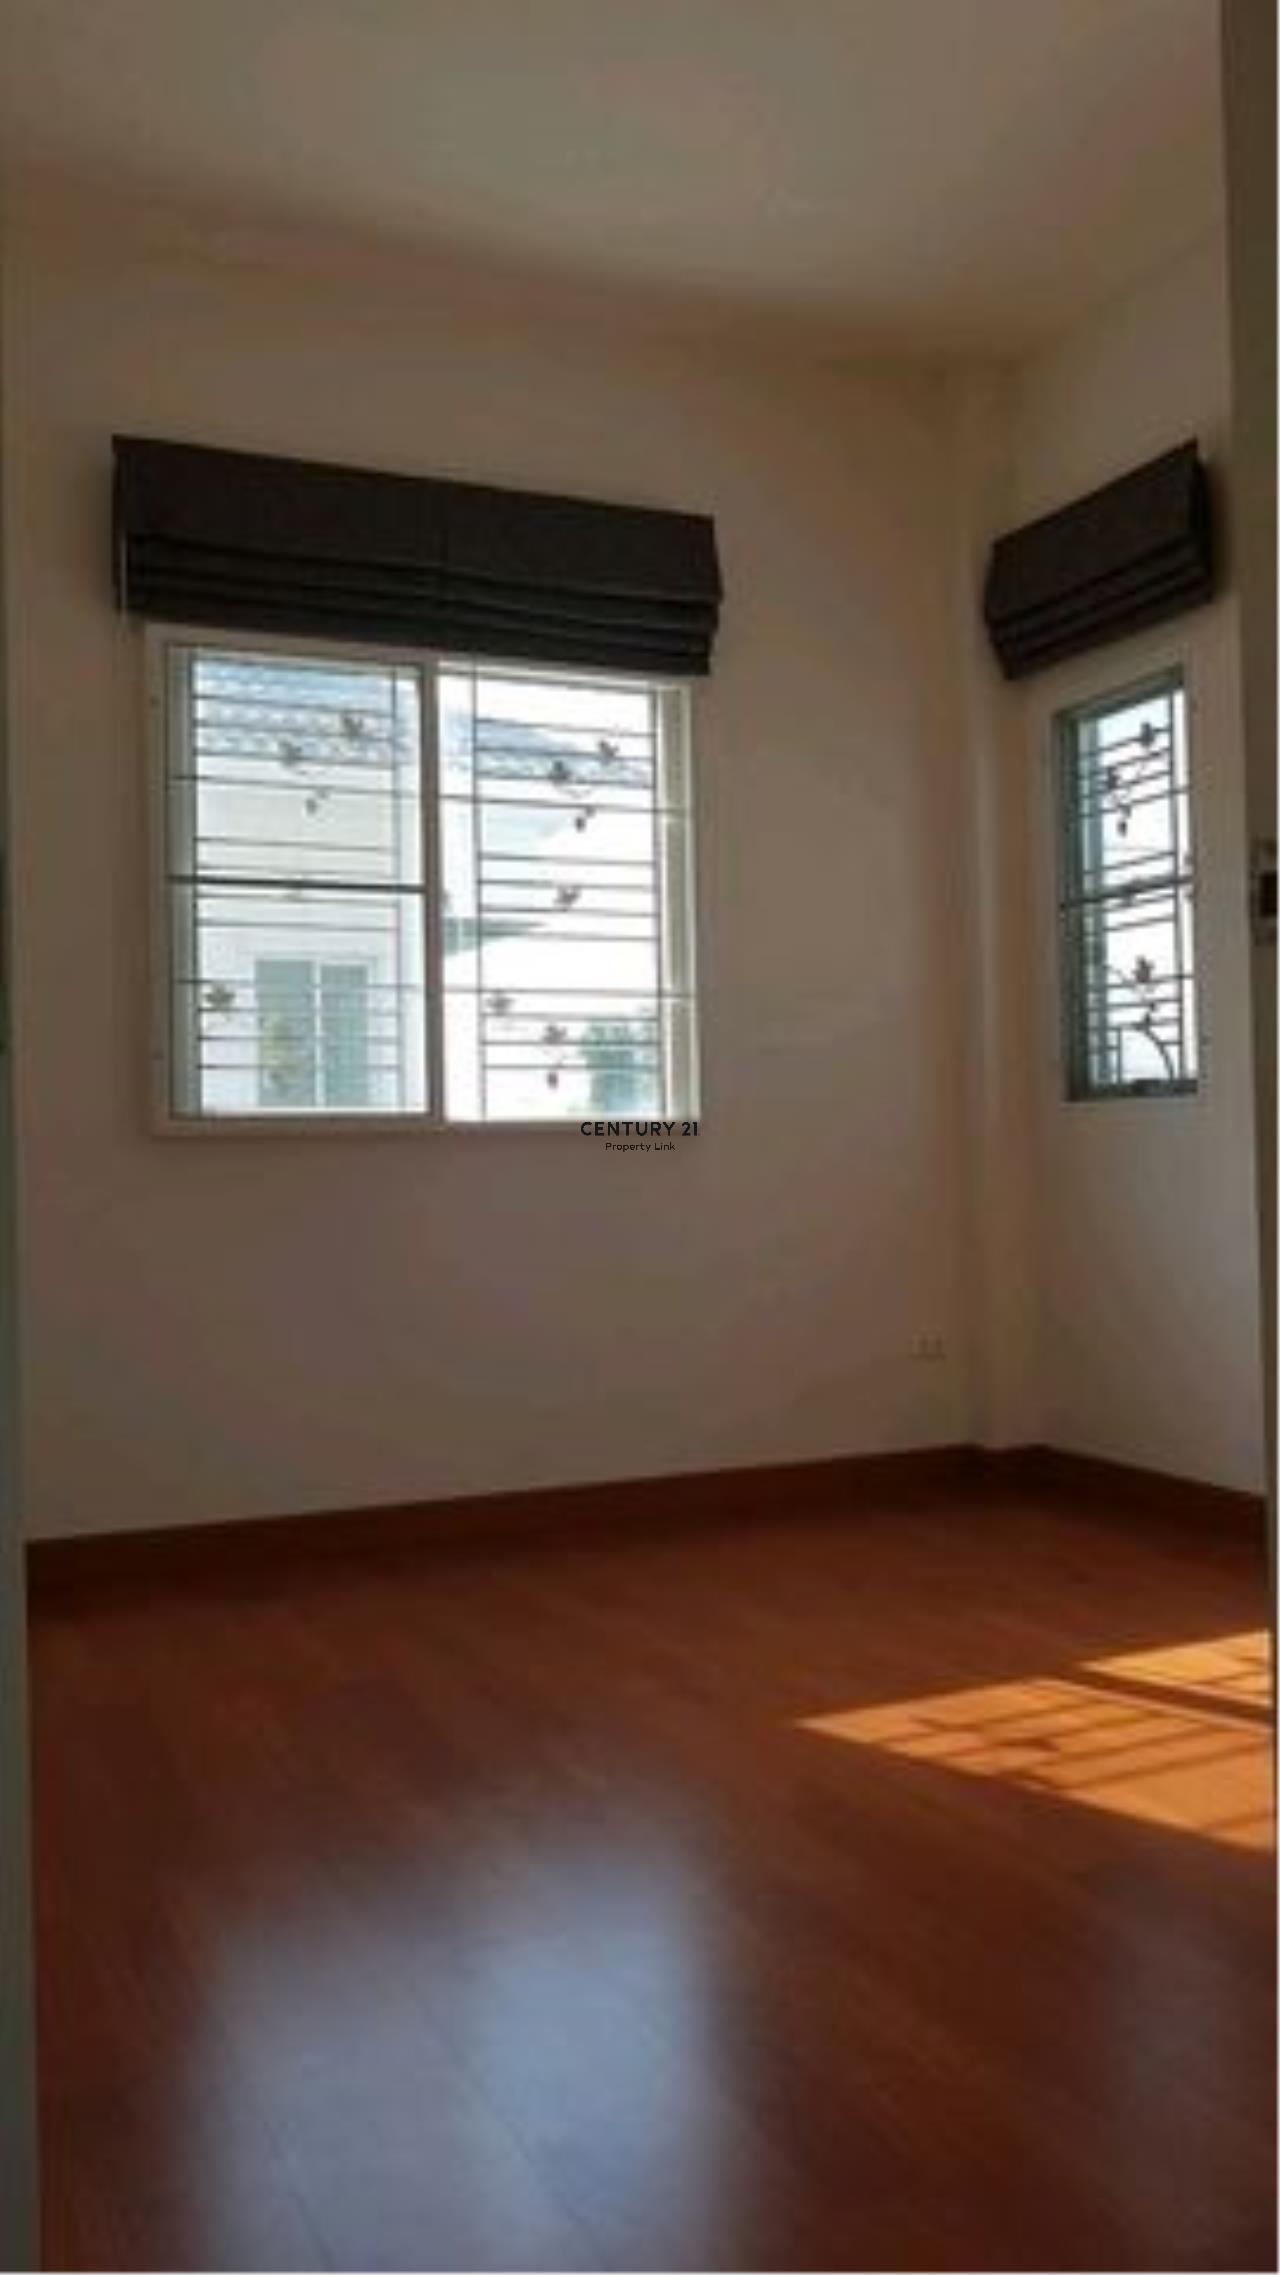 Century21 Property Link Agency's 38-HH-61070 single House @Kanchanapisek near Central Westgate 9